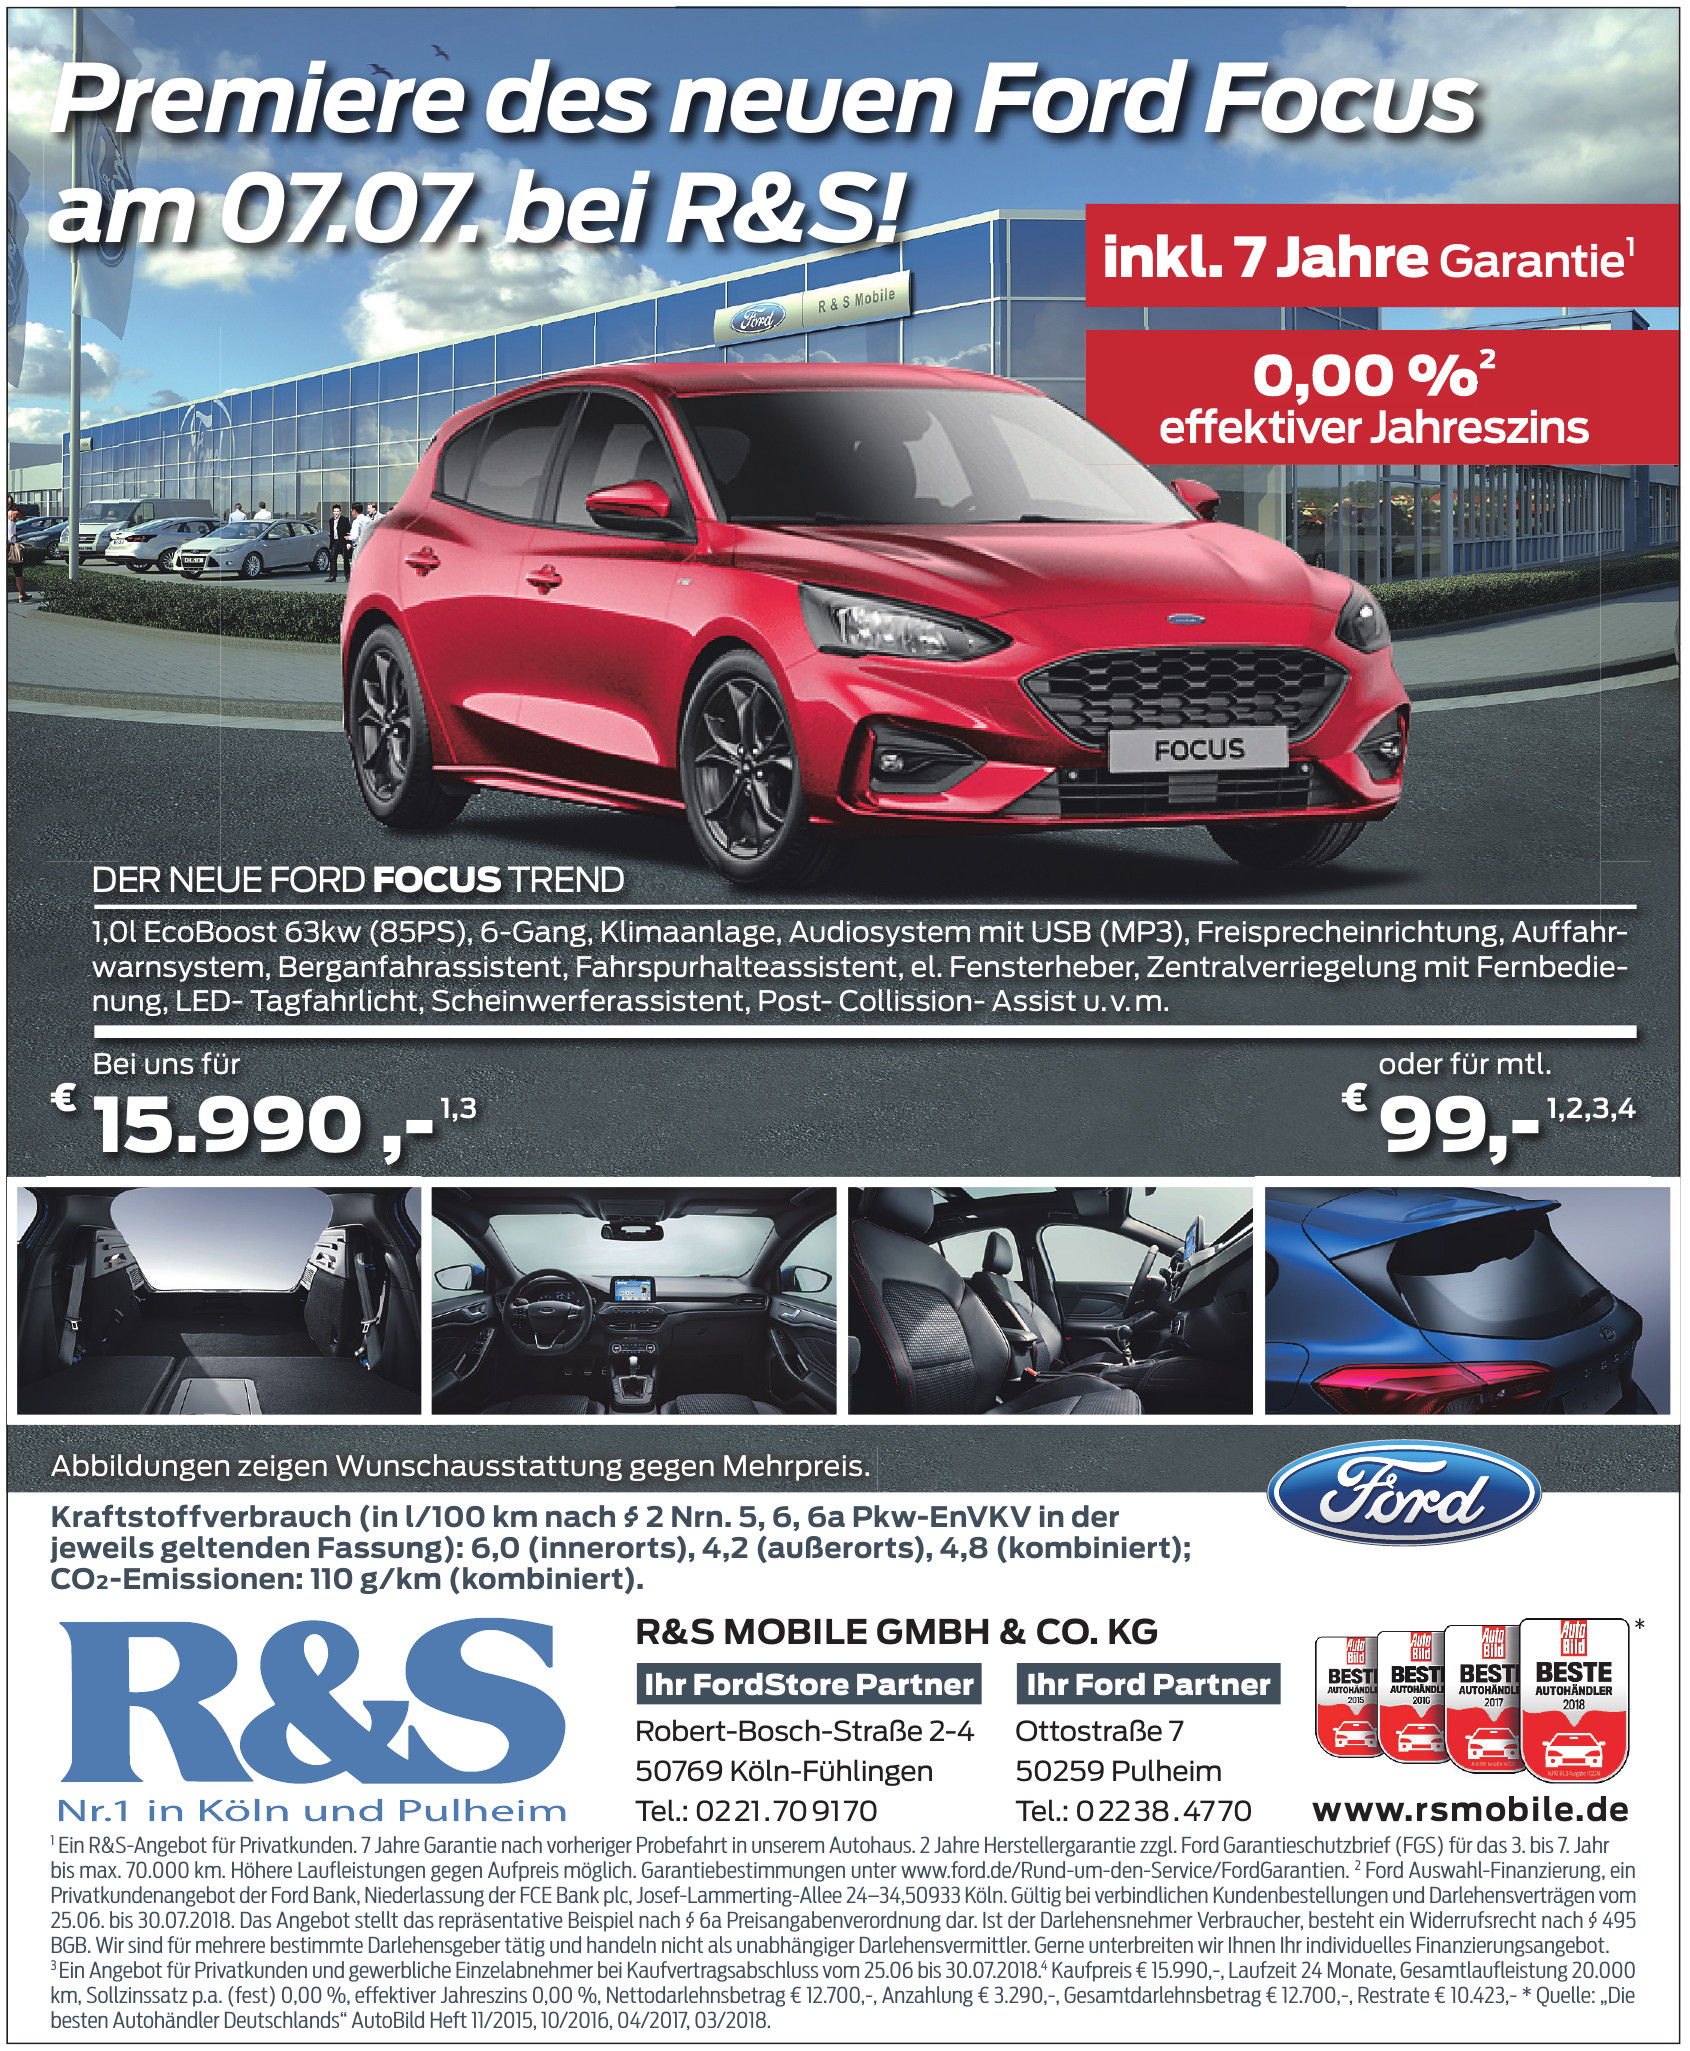 R&S Mobile GmbH & Co. KG